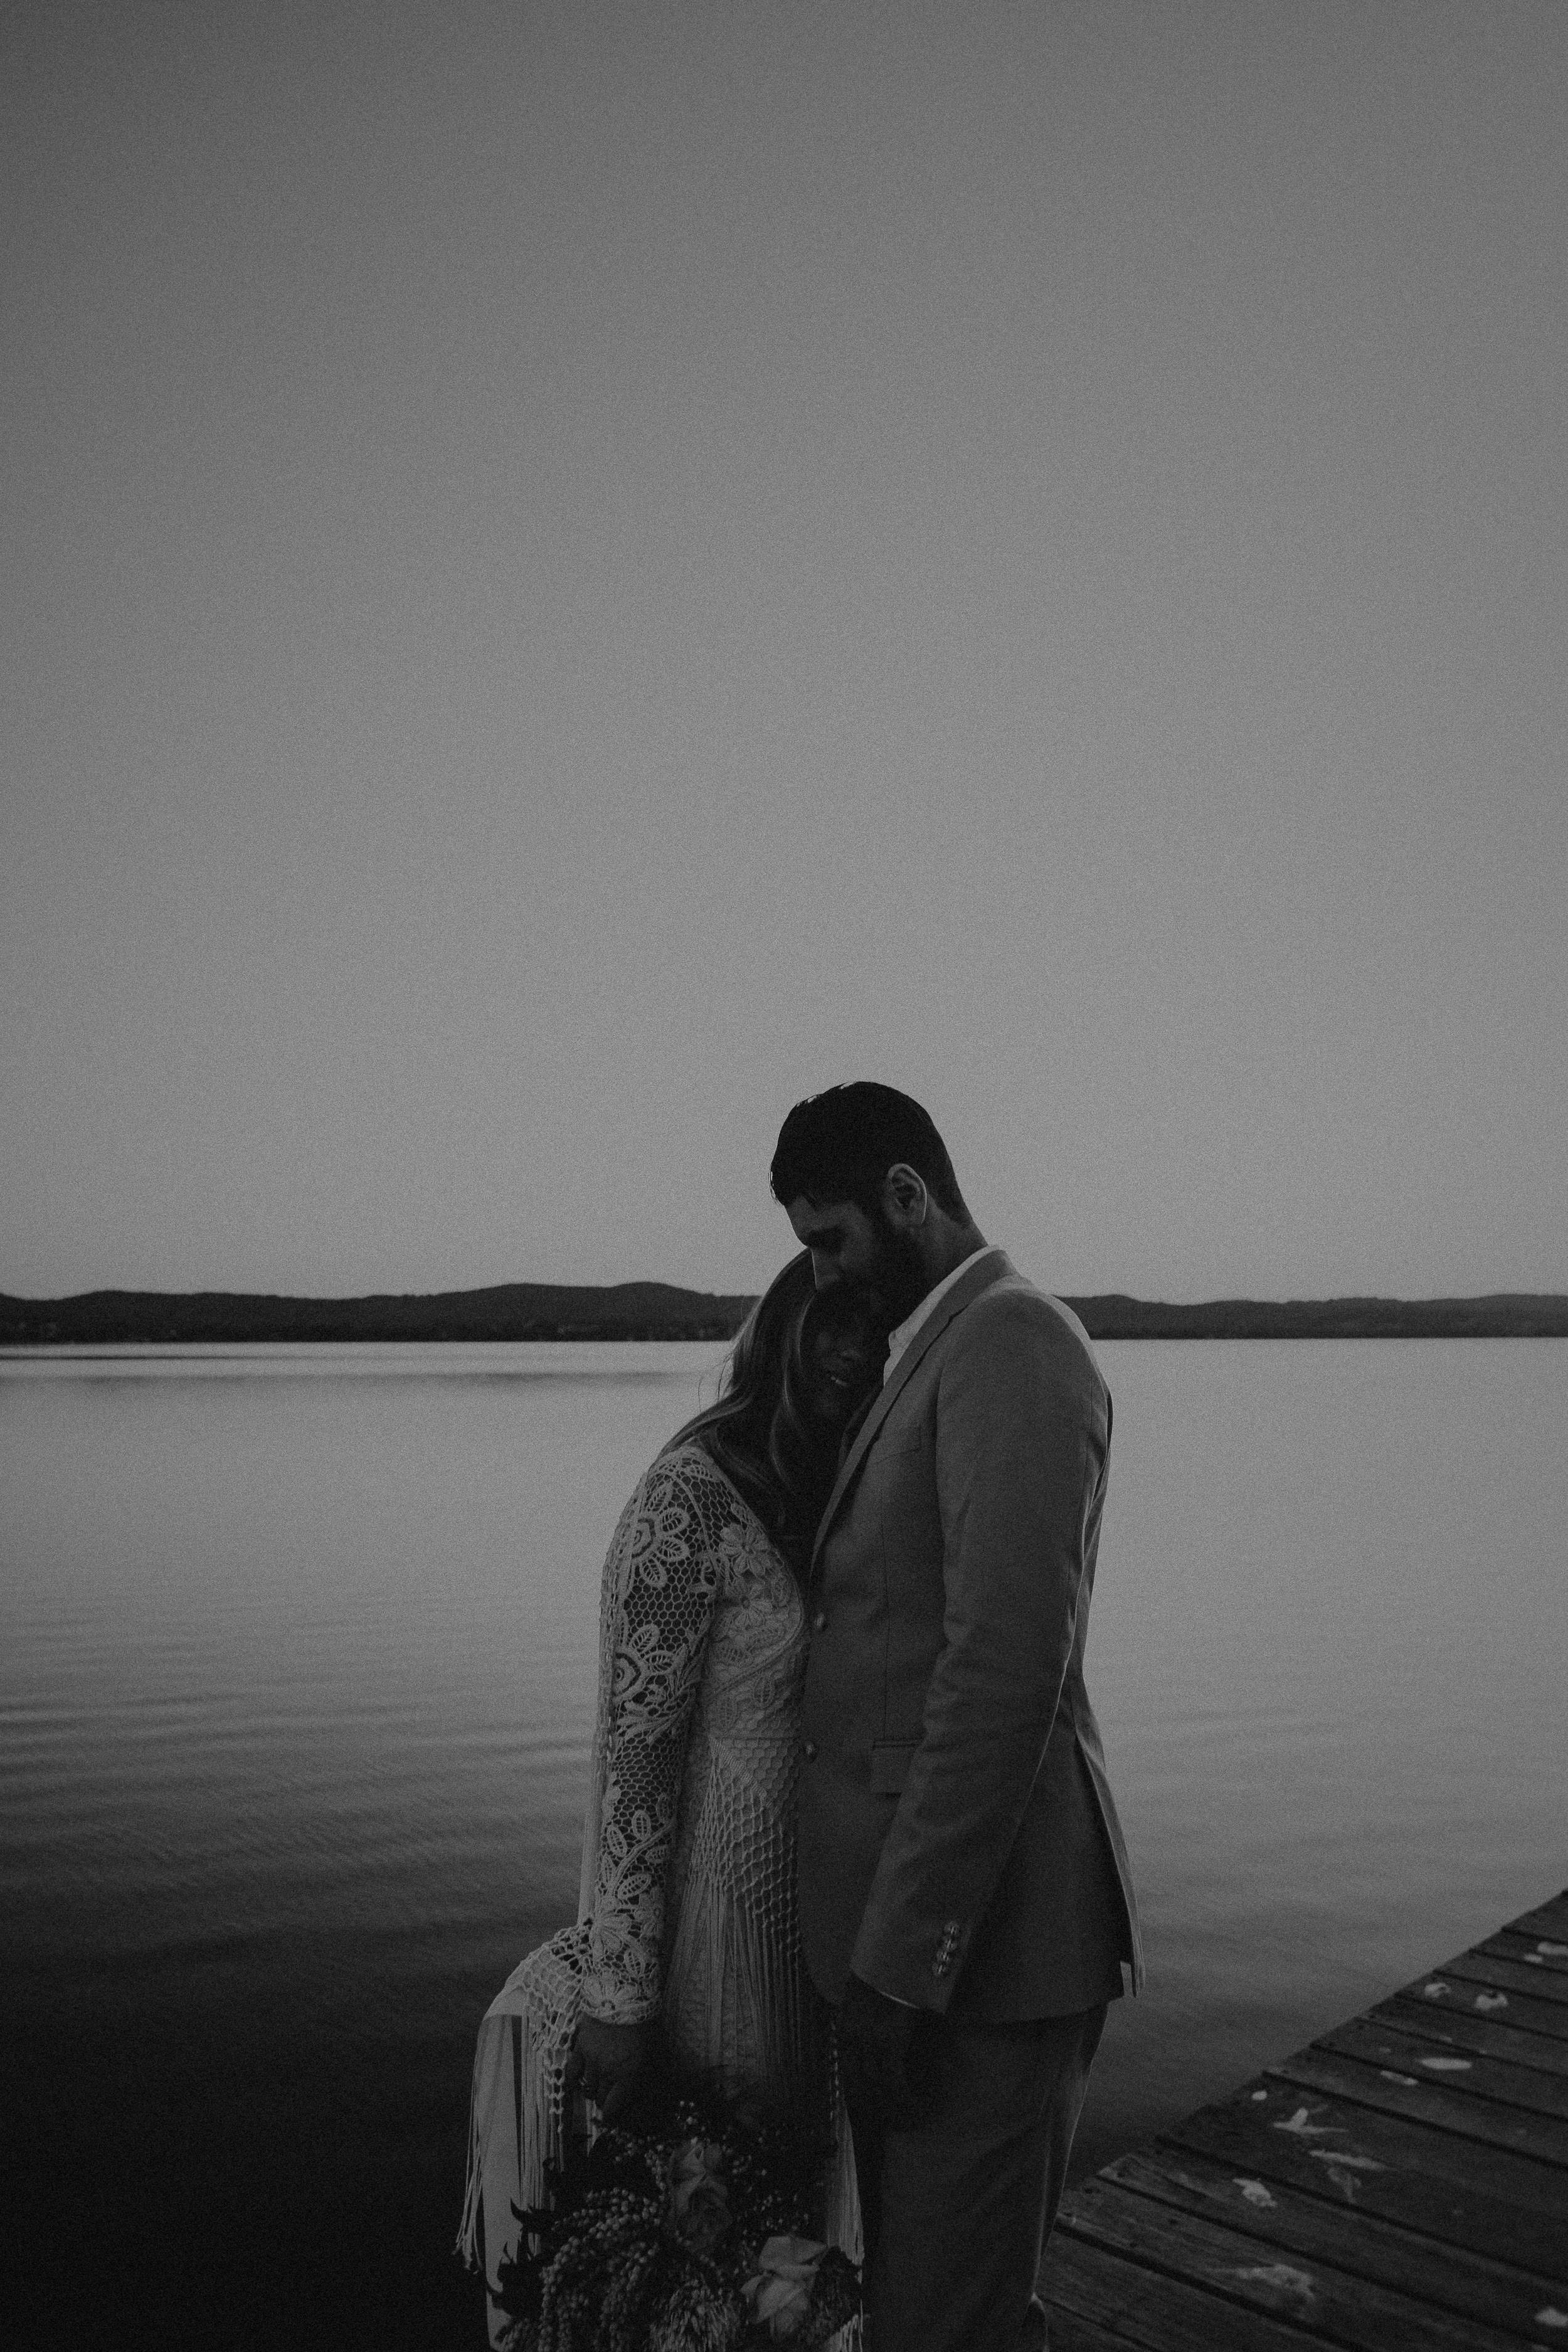 S&A Elopement - Kings & Thieves - Shred 'Til Dead - Central Coast Beach Forest Wedding - 405.jpg